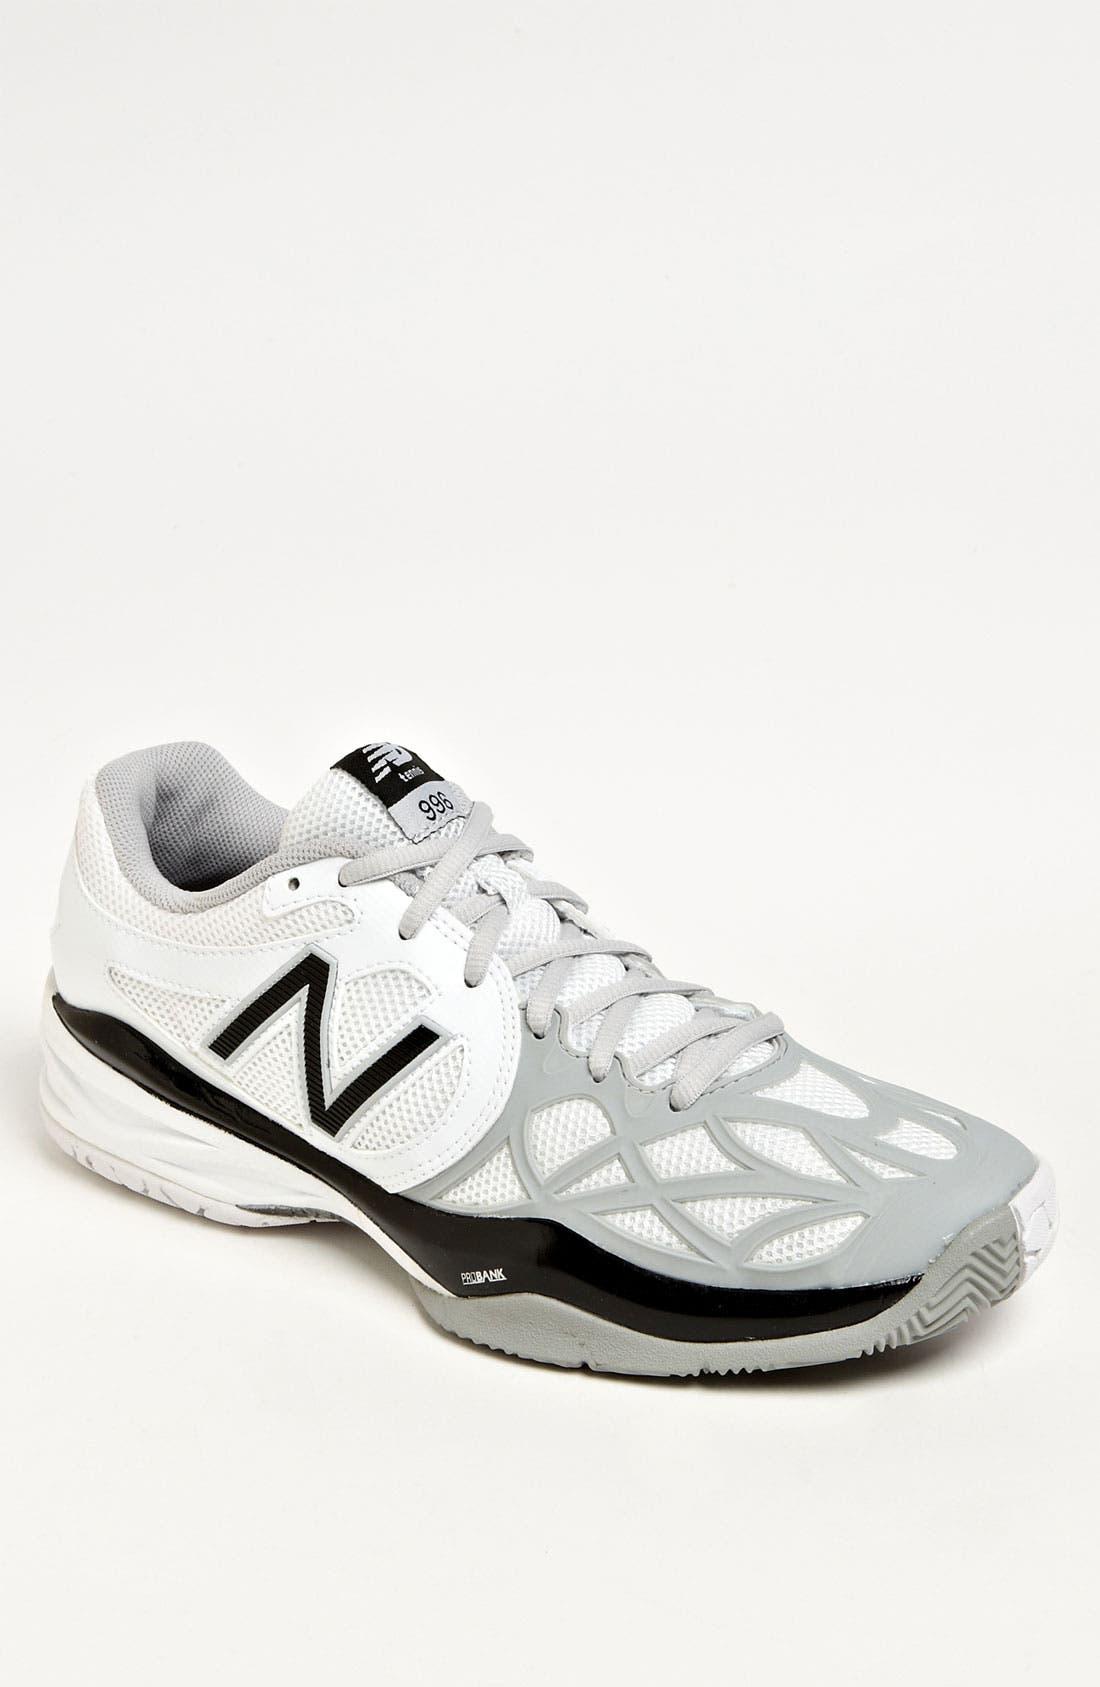 Alternate Image 1 Selected - New Balance '996' Tennis Shoe (Men)